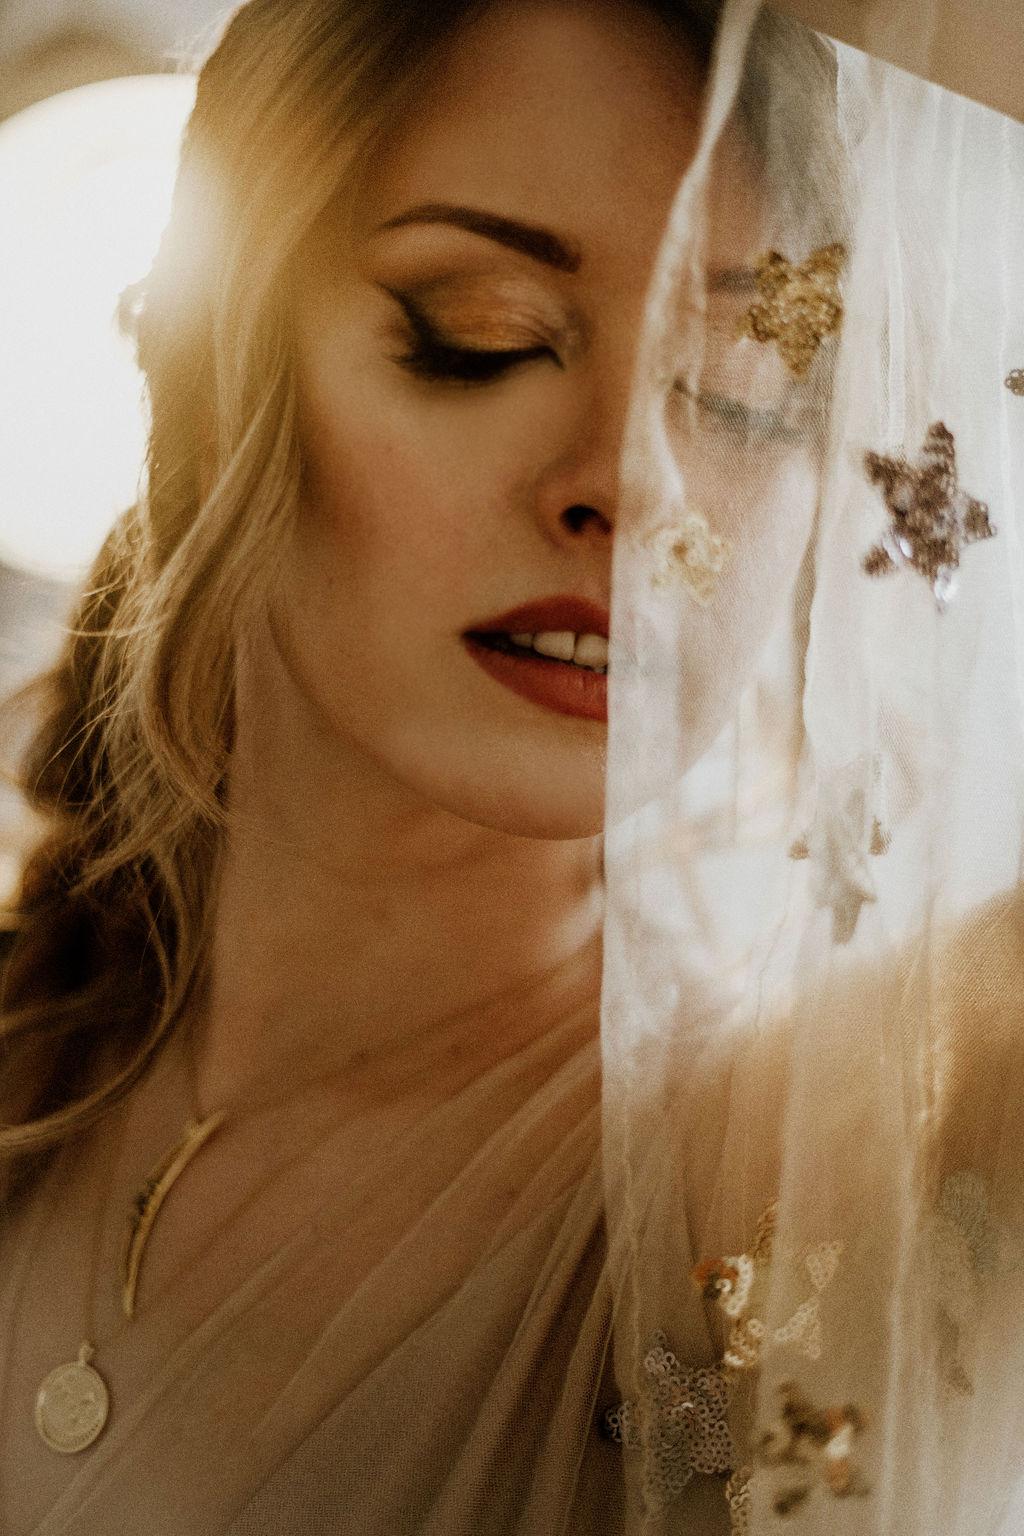 Bride holds sheer fabric of her Flutter Dress up against her face